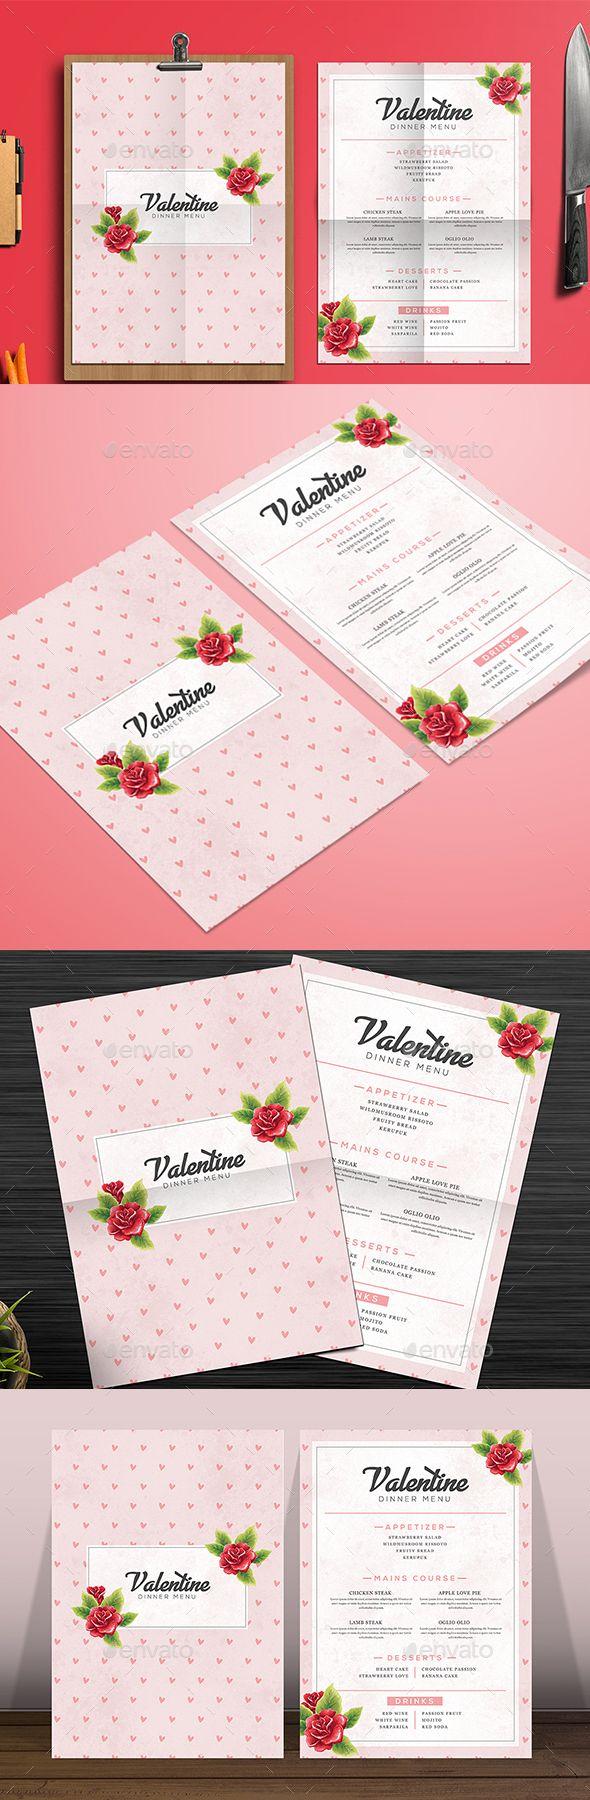 Valentine Food Menu - Food Menus Print Templates Downlaod here : https://graphicriver.net/item/valentine-food-menu/19397840?s_rank=11&ref=Al-fatih